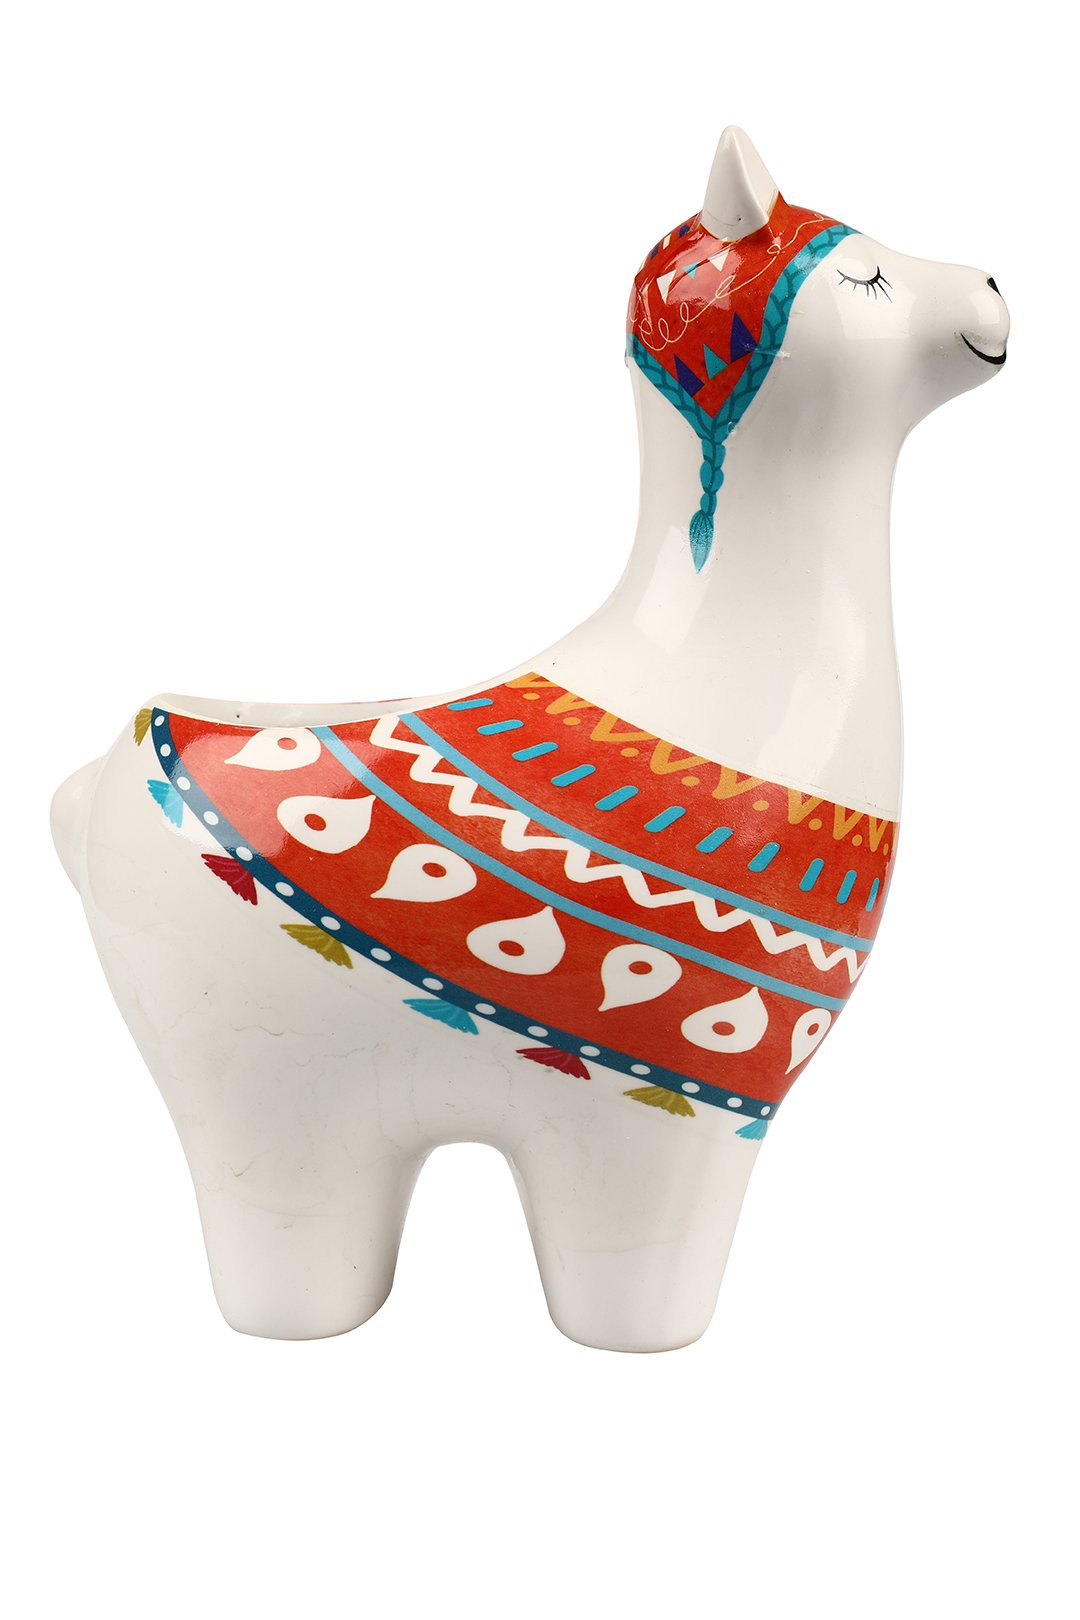 Small Orange Llama Ceramic Pot.